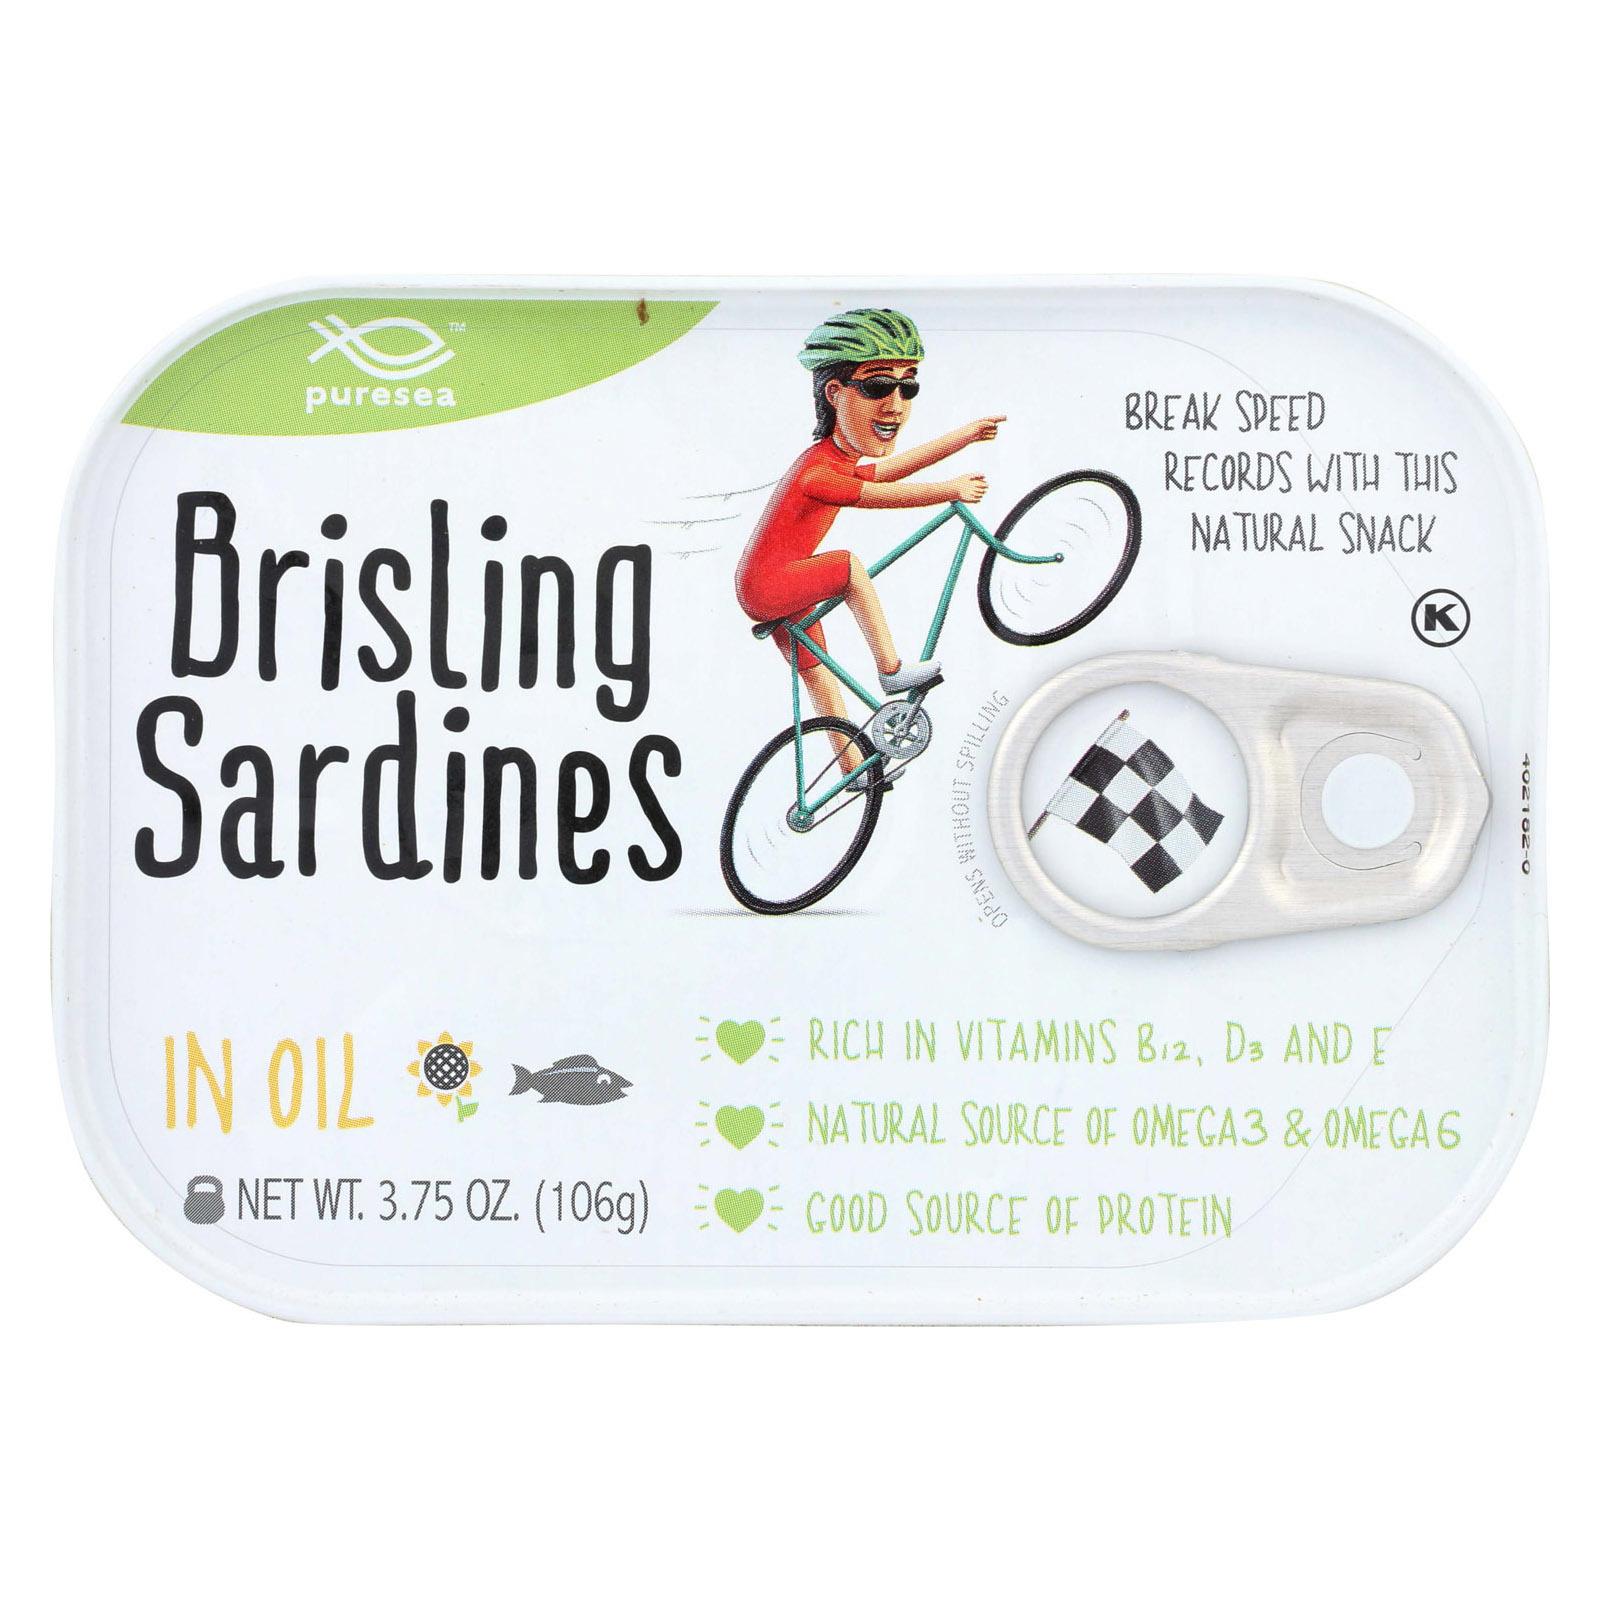 Pure Sea Sardines - Brisling - Oil - Case of 12 - 3.75 oz